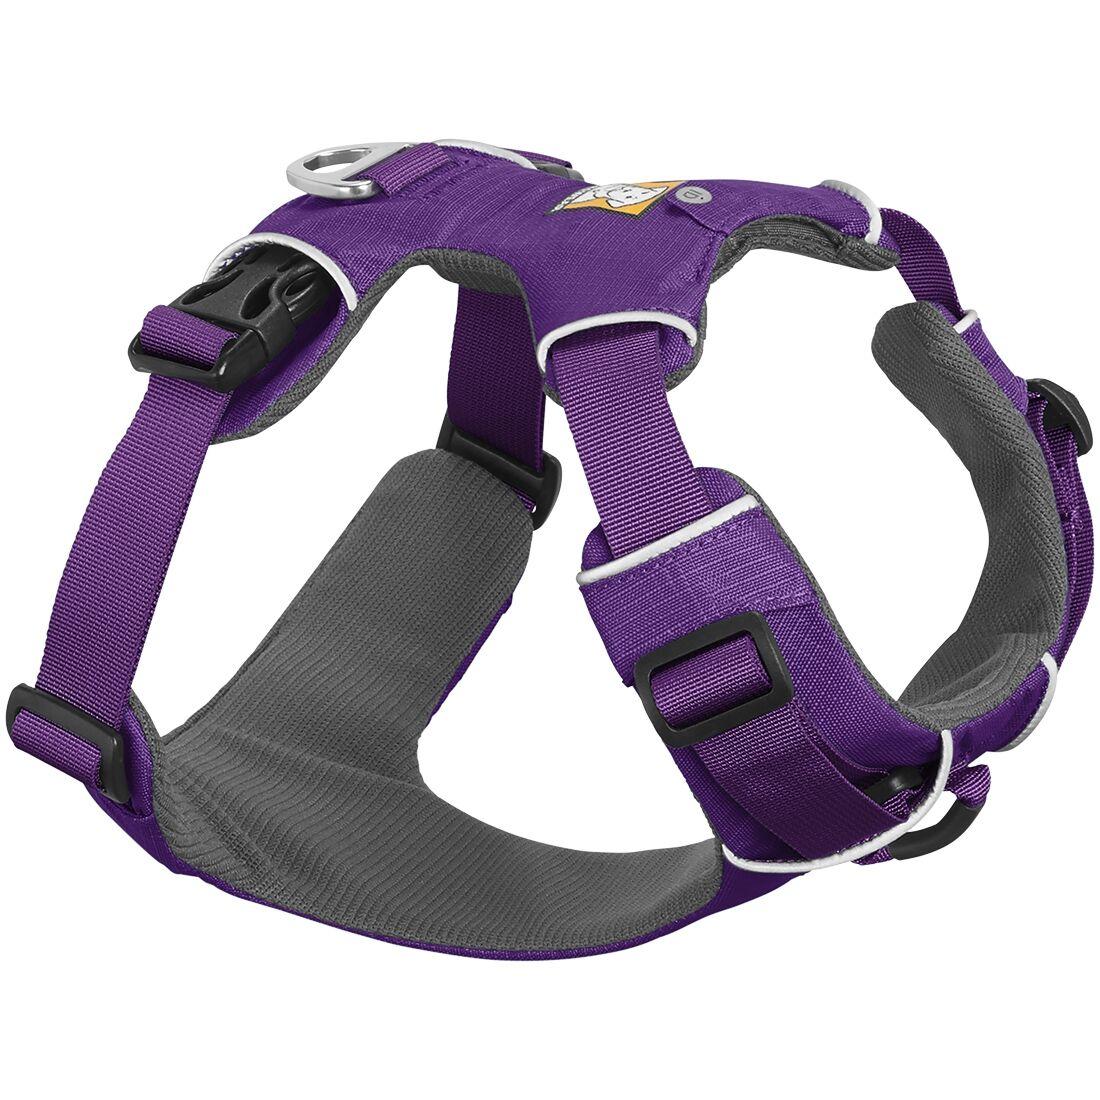 Ruffwear Harnais pour chien Ruffwear Front Range violet Taille : XXS